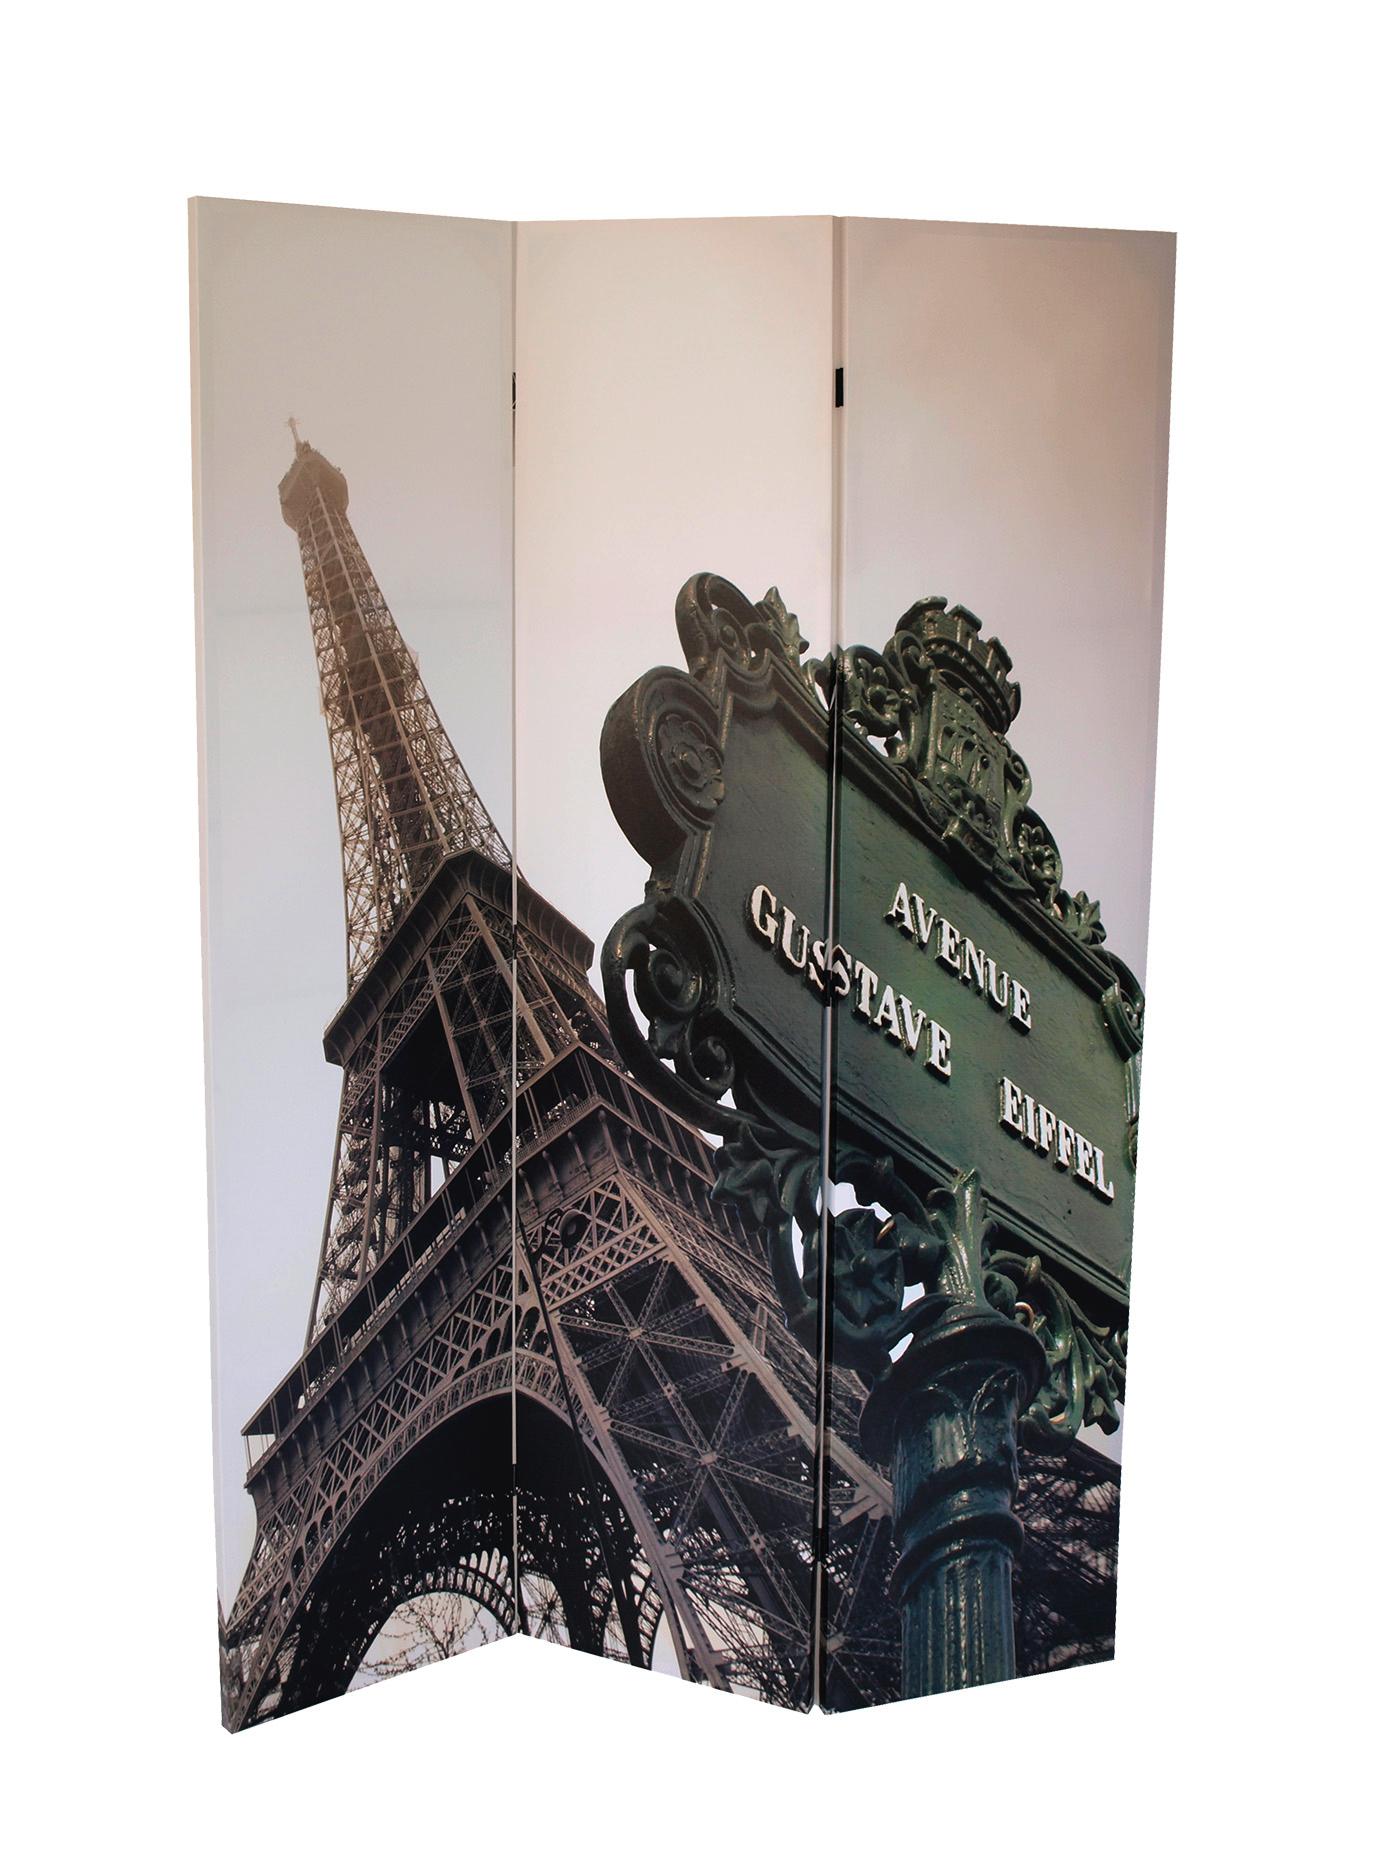 paravent eiffelturm 3 teilig bedruckte leinwand raumteiler. Black Bedroom Furniture Sets. Home Design Ideas